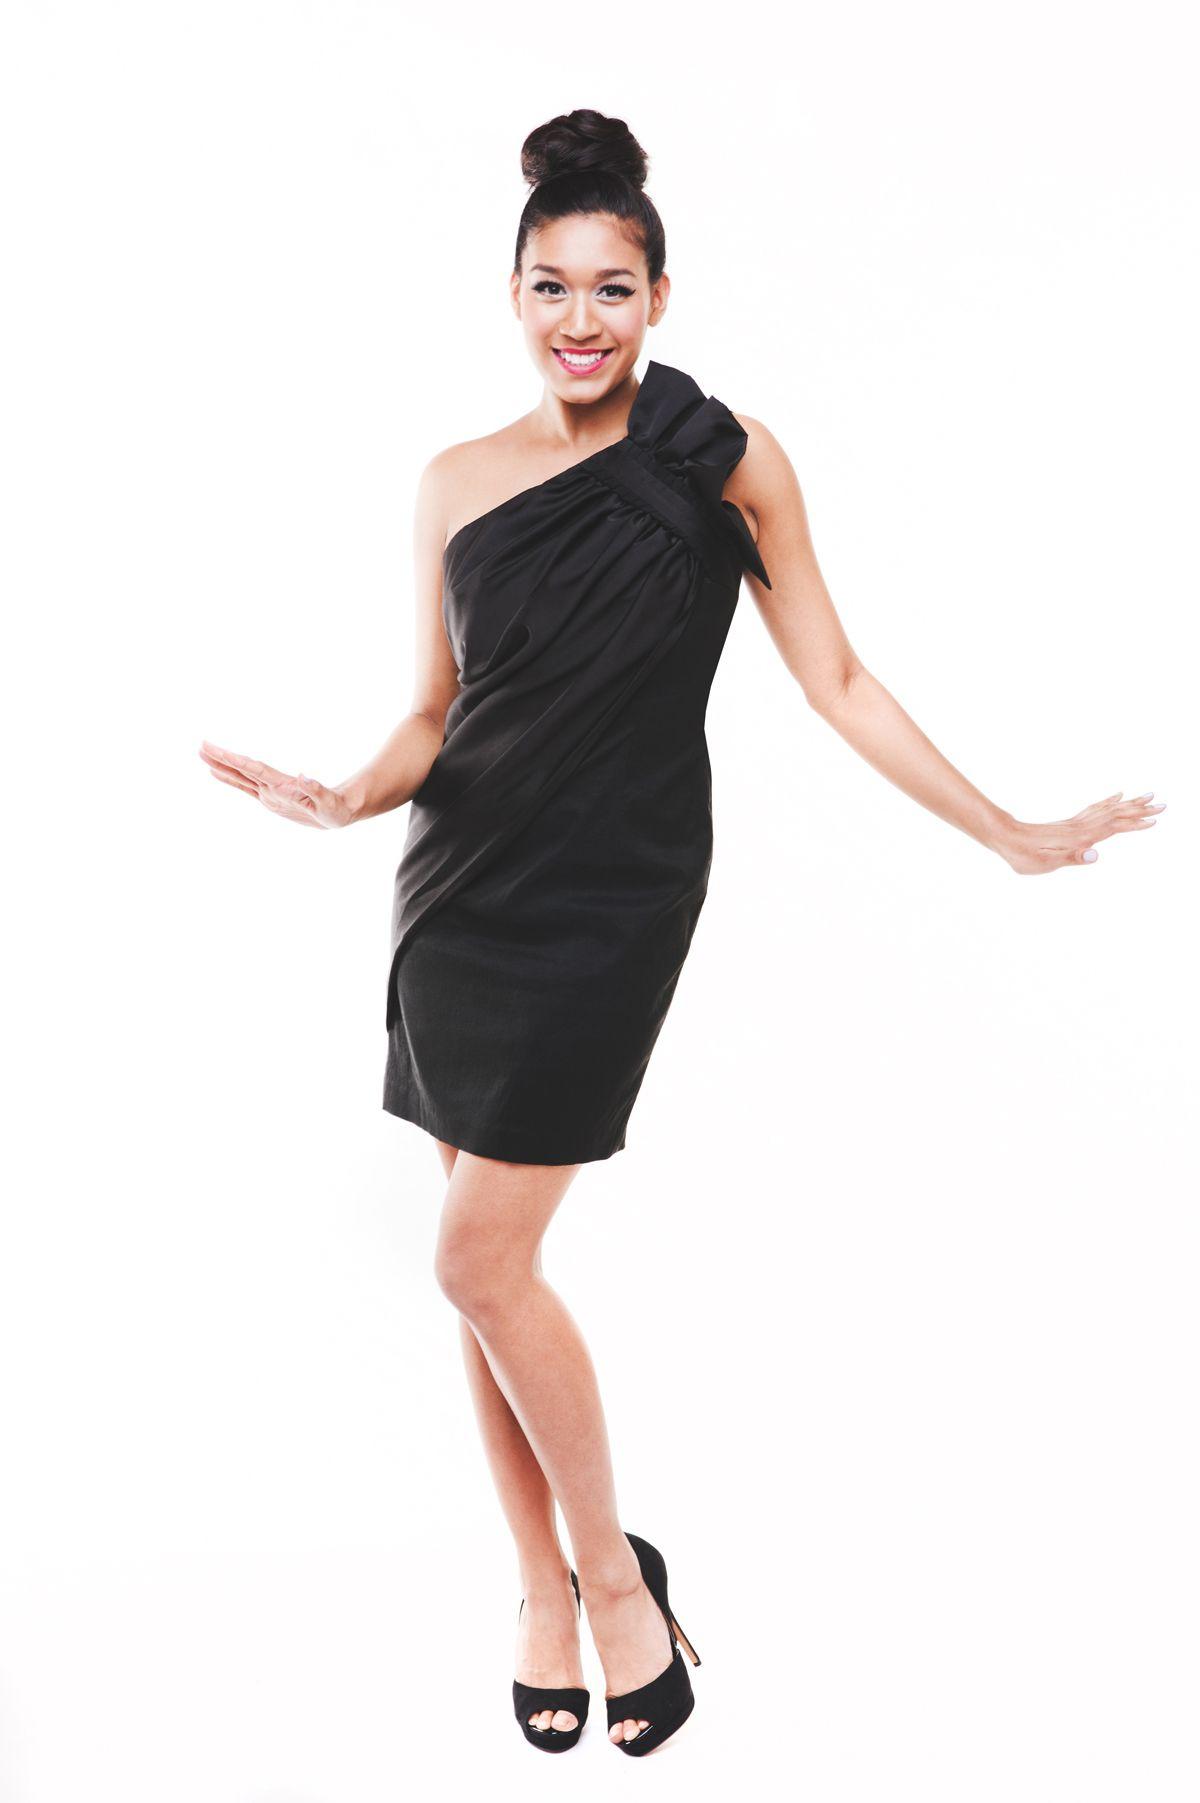 159aud emily thorne dress in black bridesmaids bridesmaid 159aud emily thorne dress in black bridesmaids bridesmaid dress ombrellifo Gallery